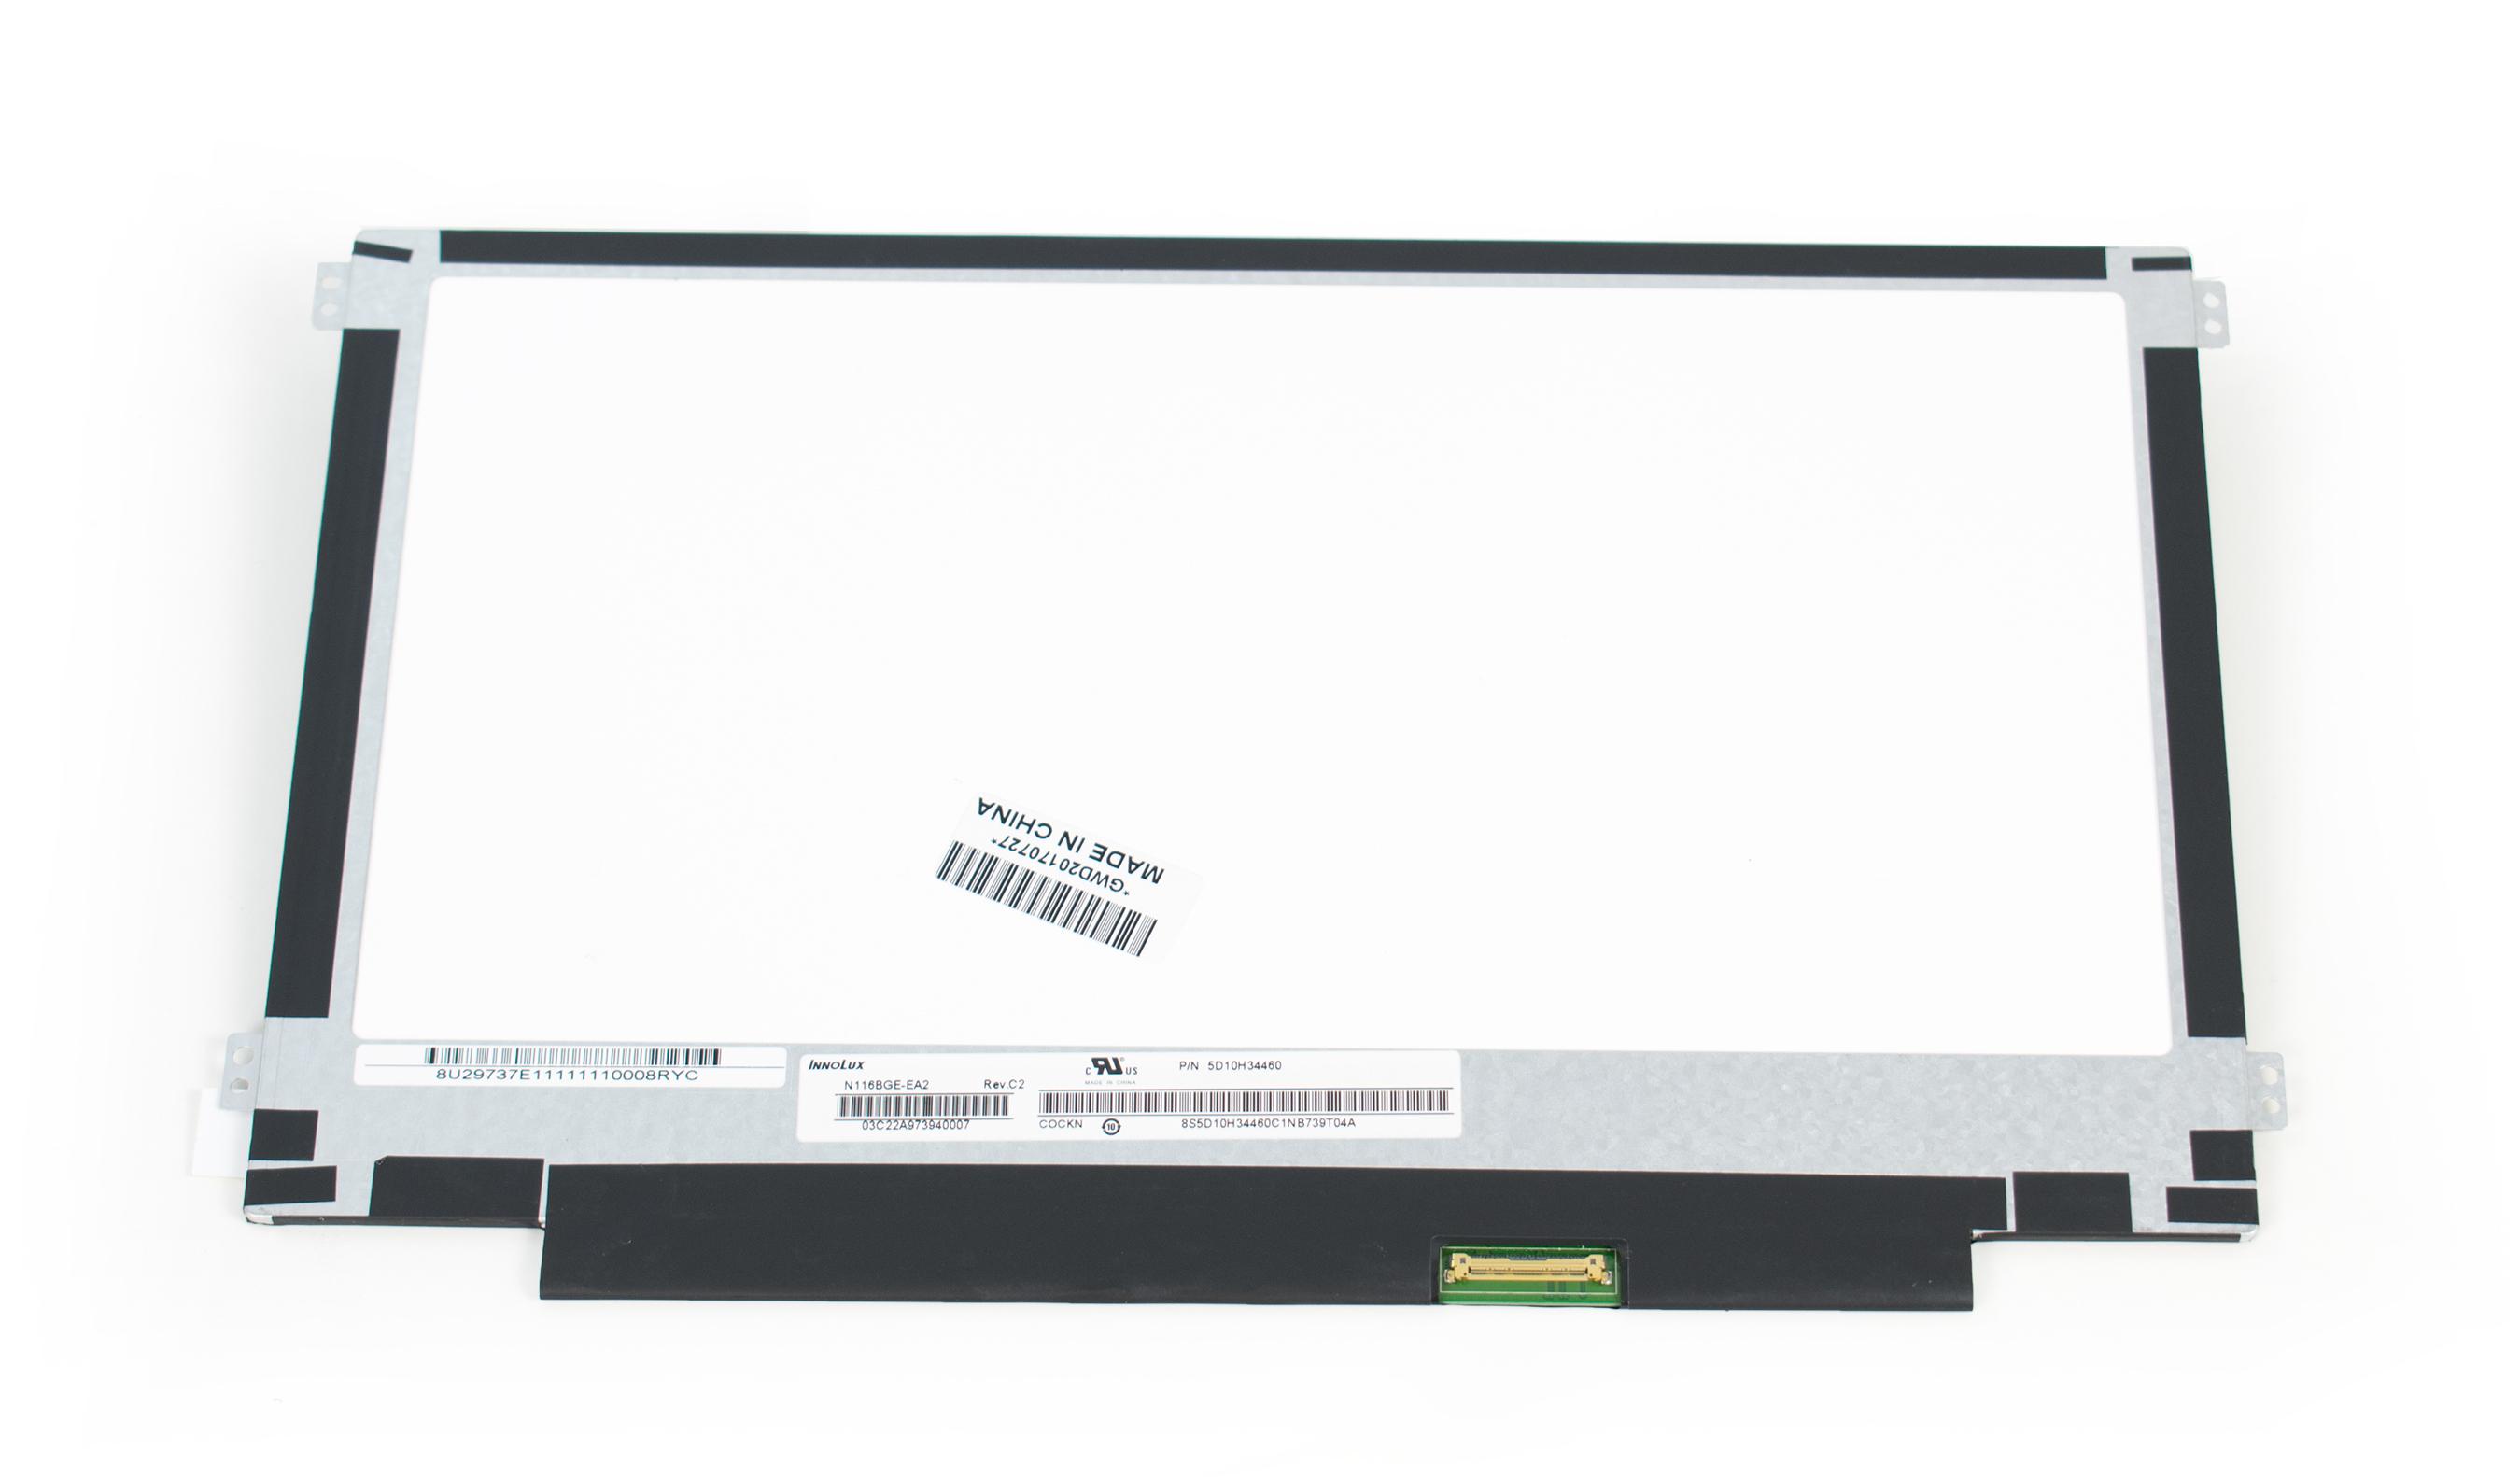 New Lenovo N22 80S6 PN 5D10K38951 LCD Screen  for Laptop   Display